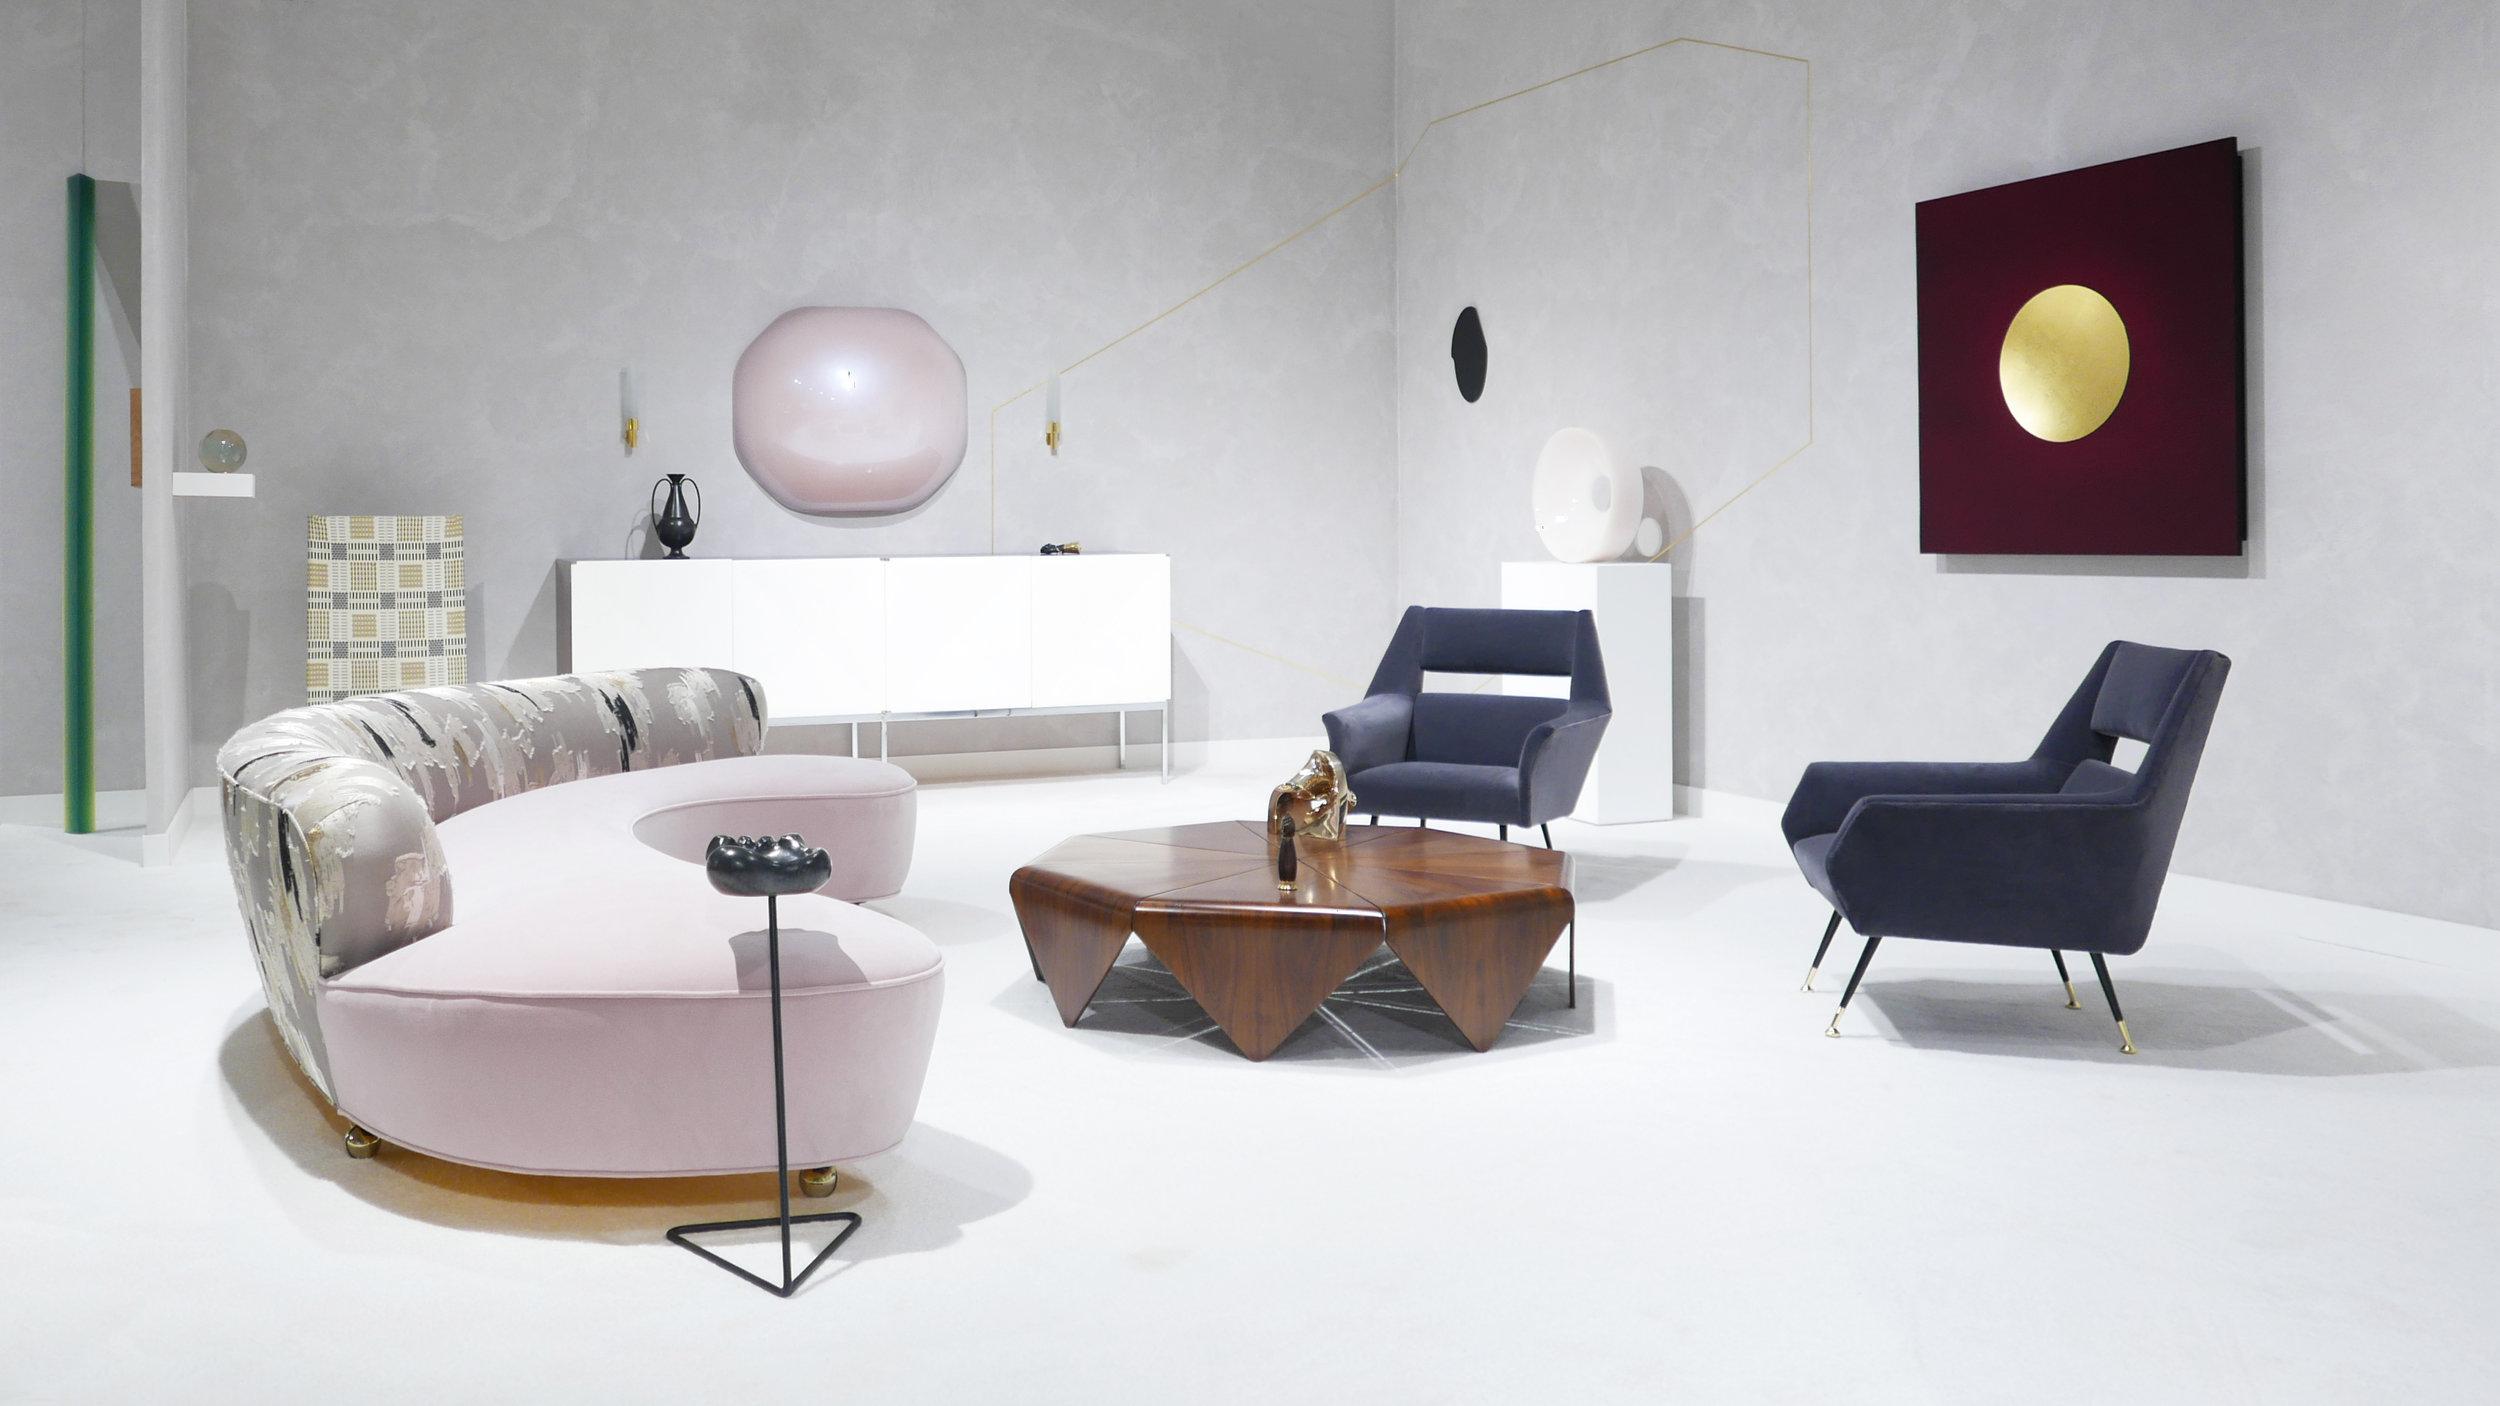 Collective Design New York 2018_Peter Blake Gallery_Installation View_6.jpg